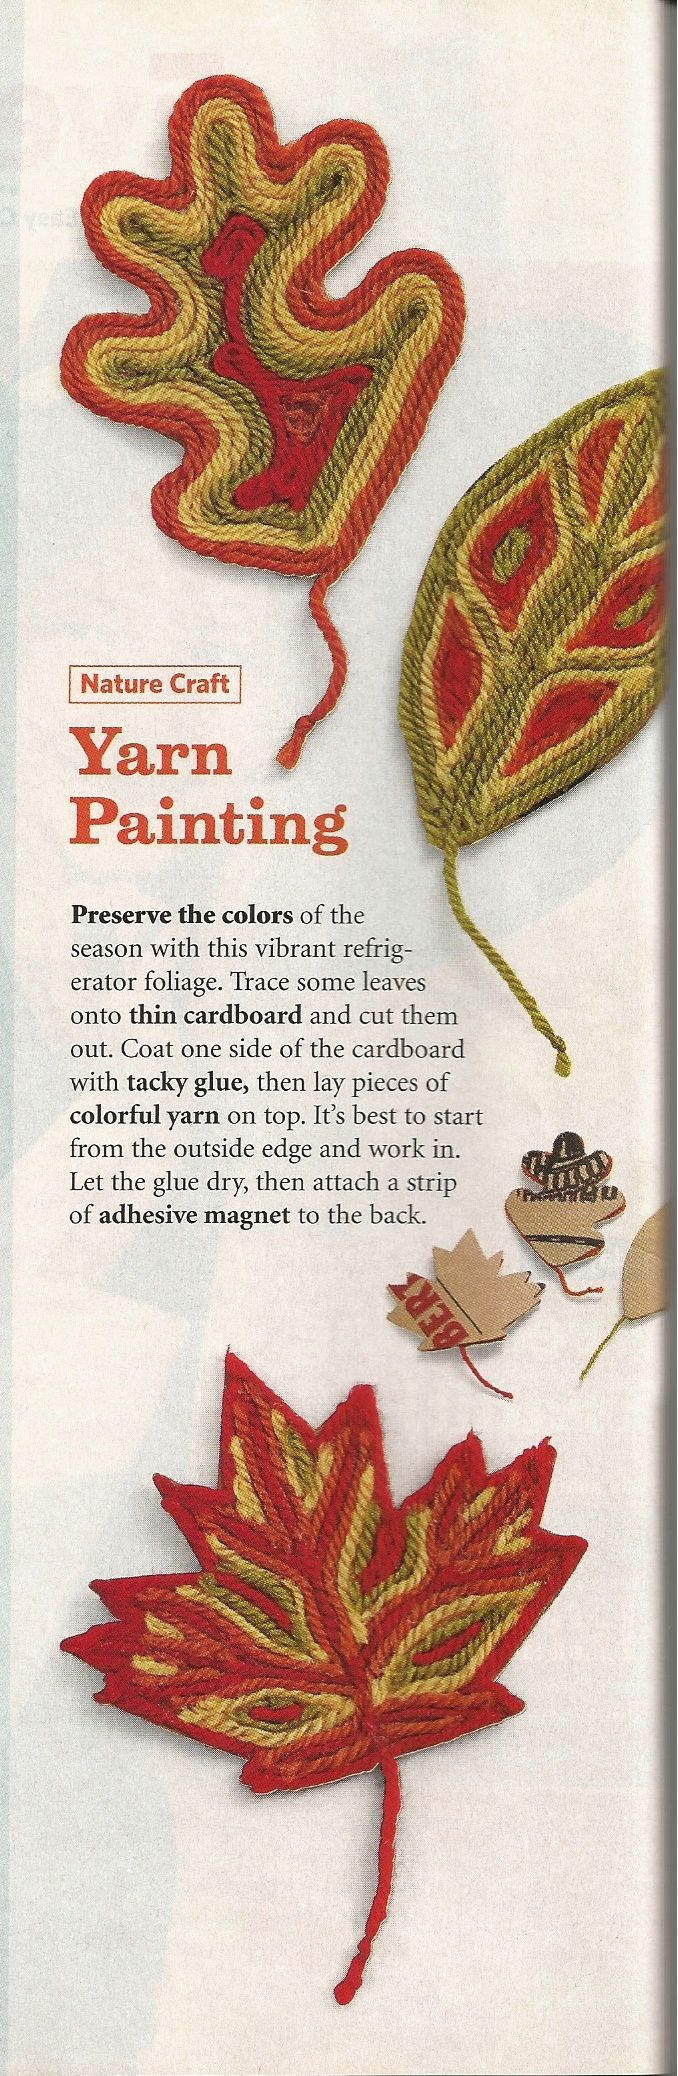 yarn painting preschool - photo #22